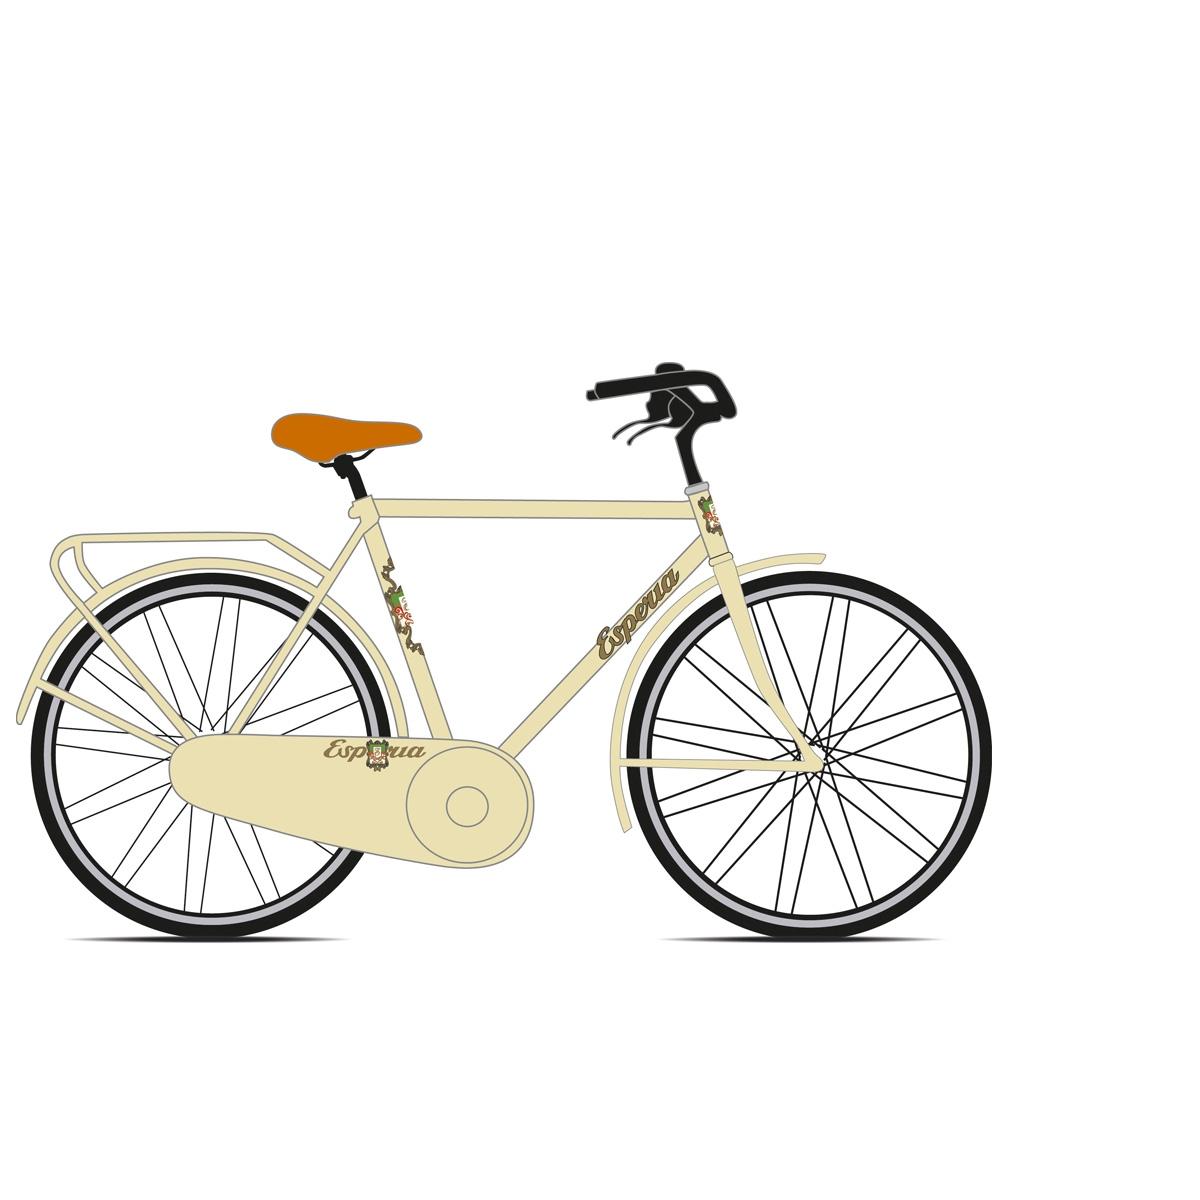 Vélo vintage Esperia homme 2280u Retro' Creme